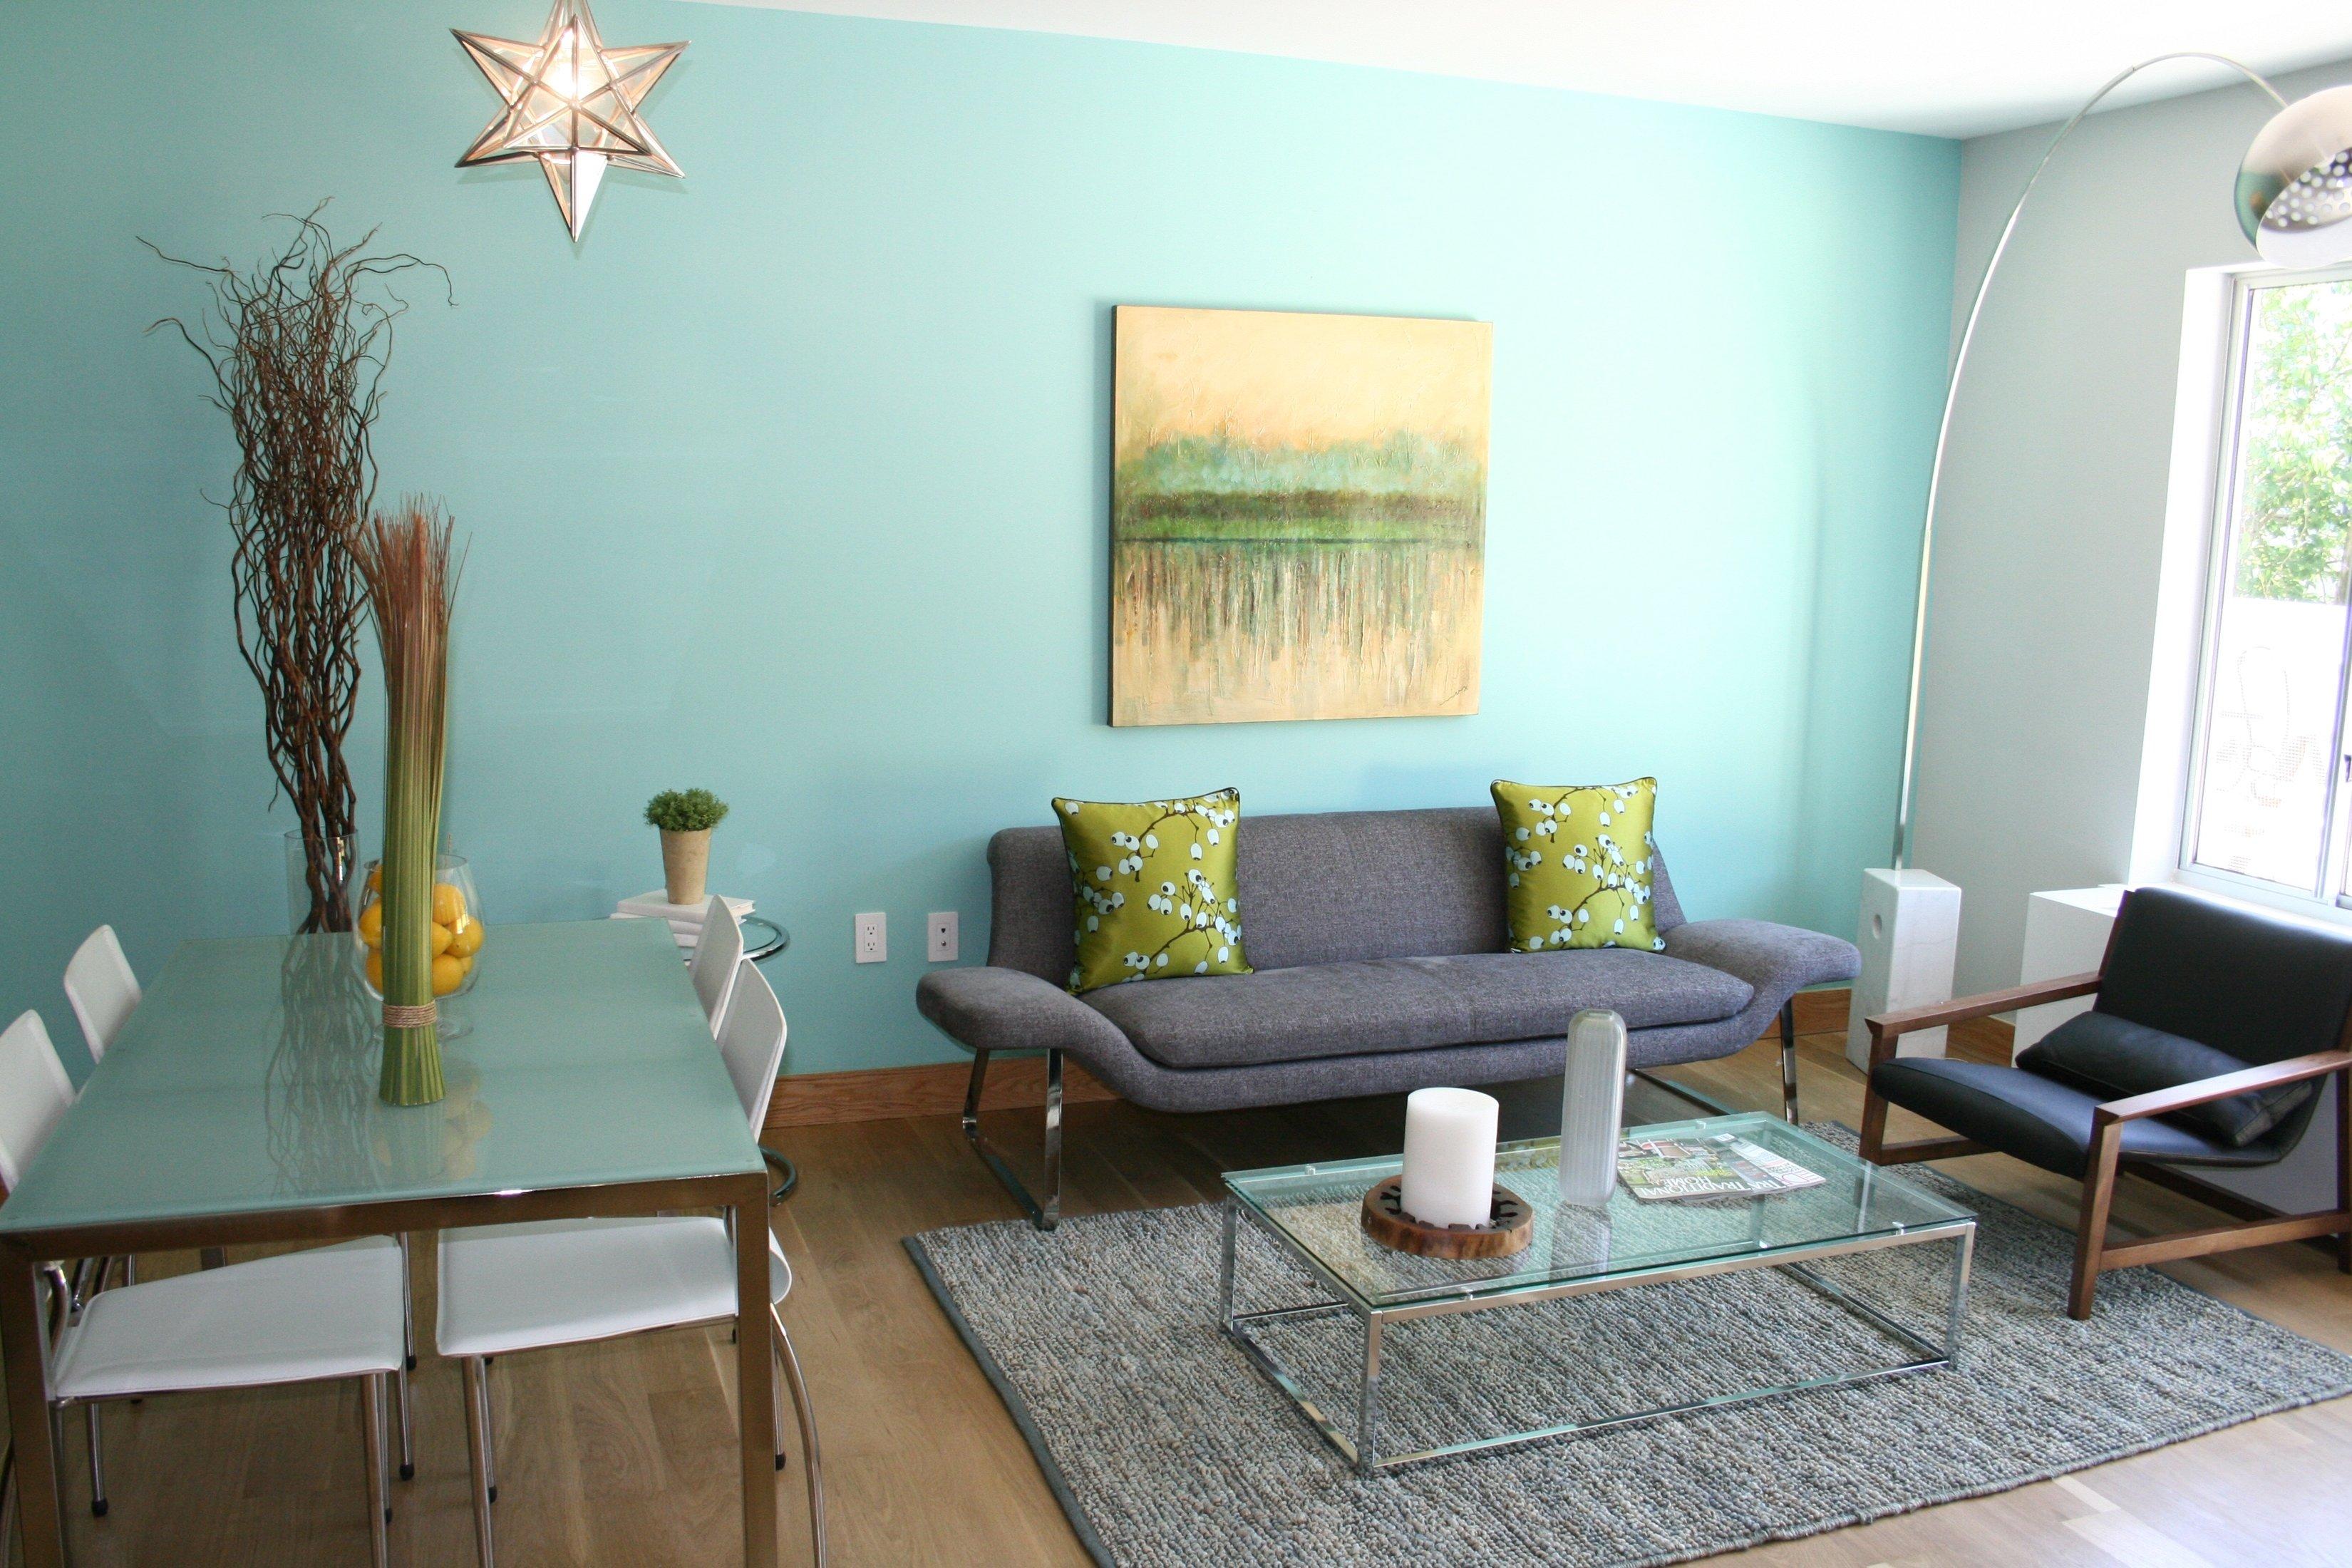 10 Perfect Apartment Decorating Ideas On A Budget apartment apartment easy and cheap cool decorating ideas unique 2021